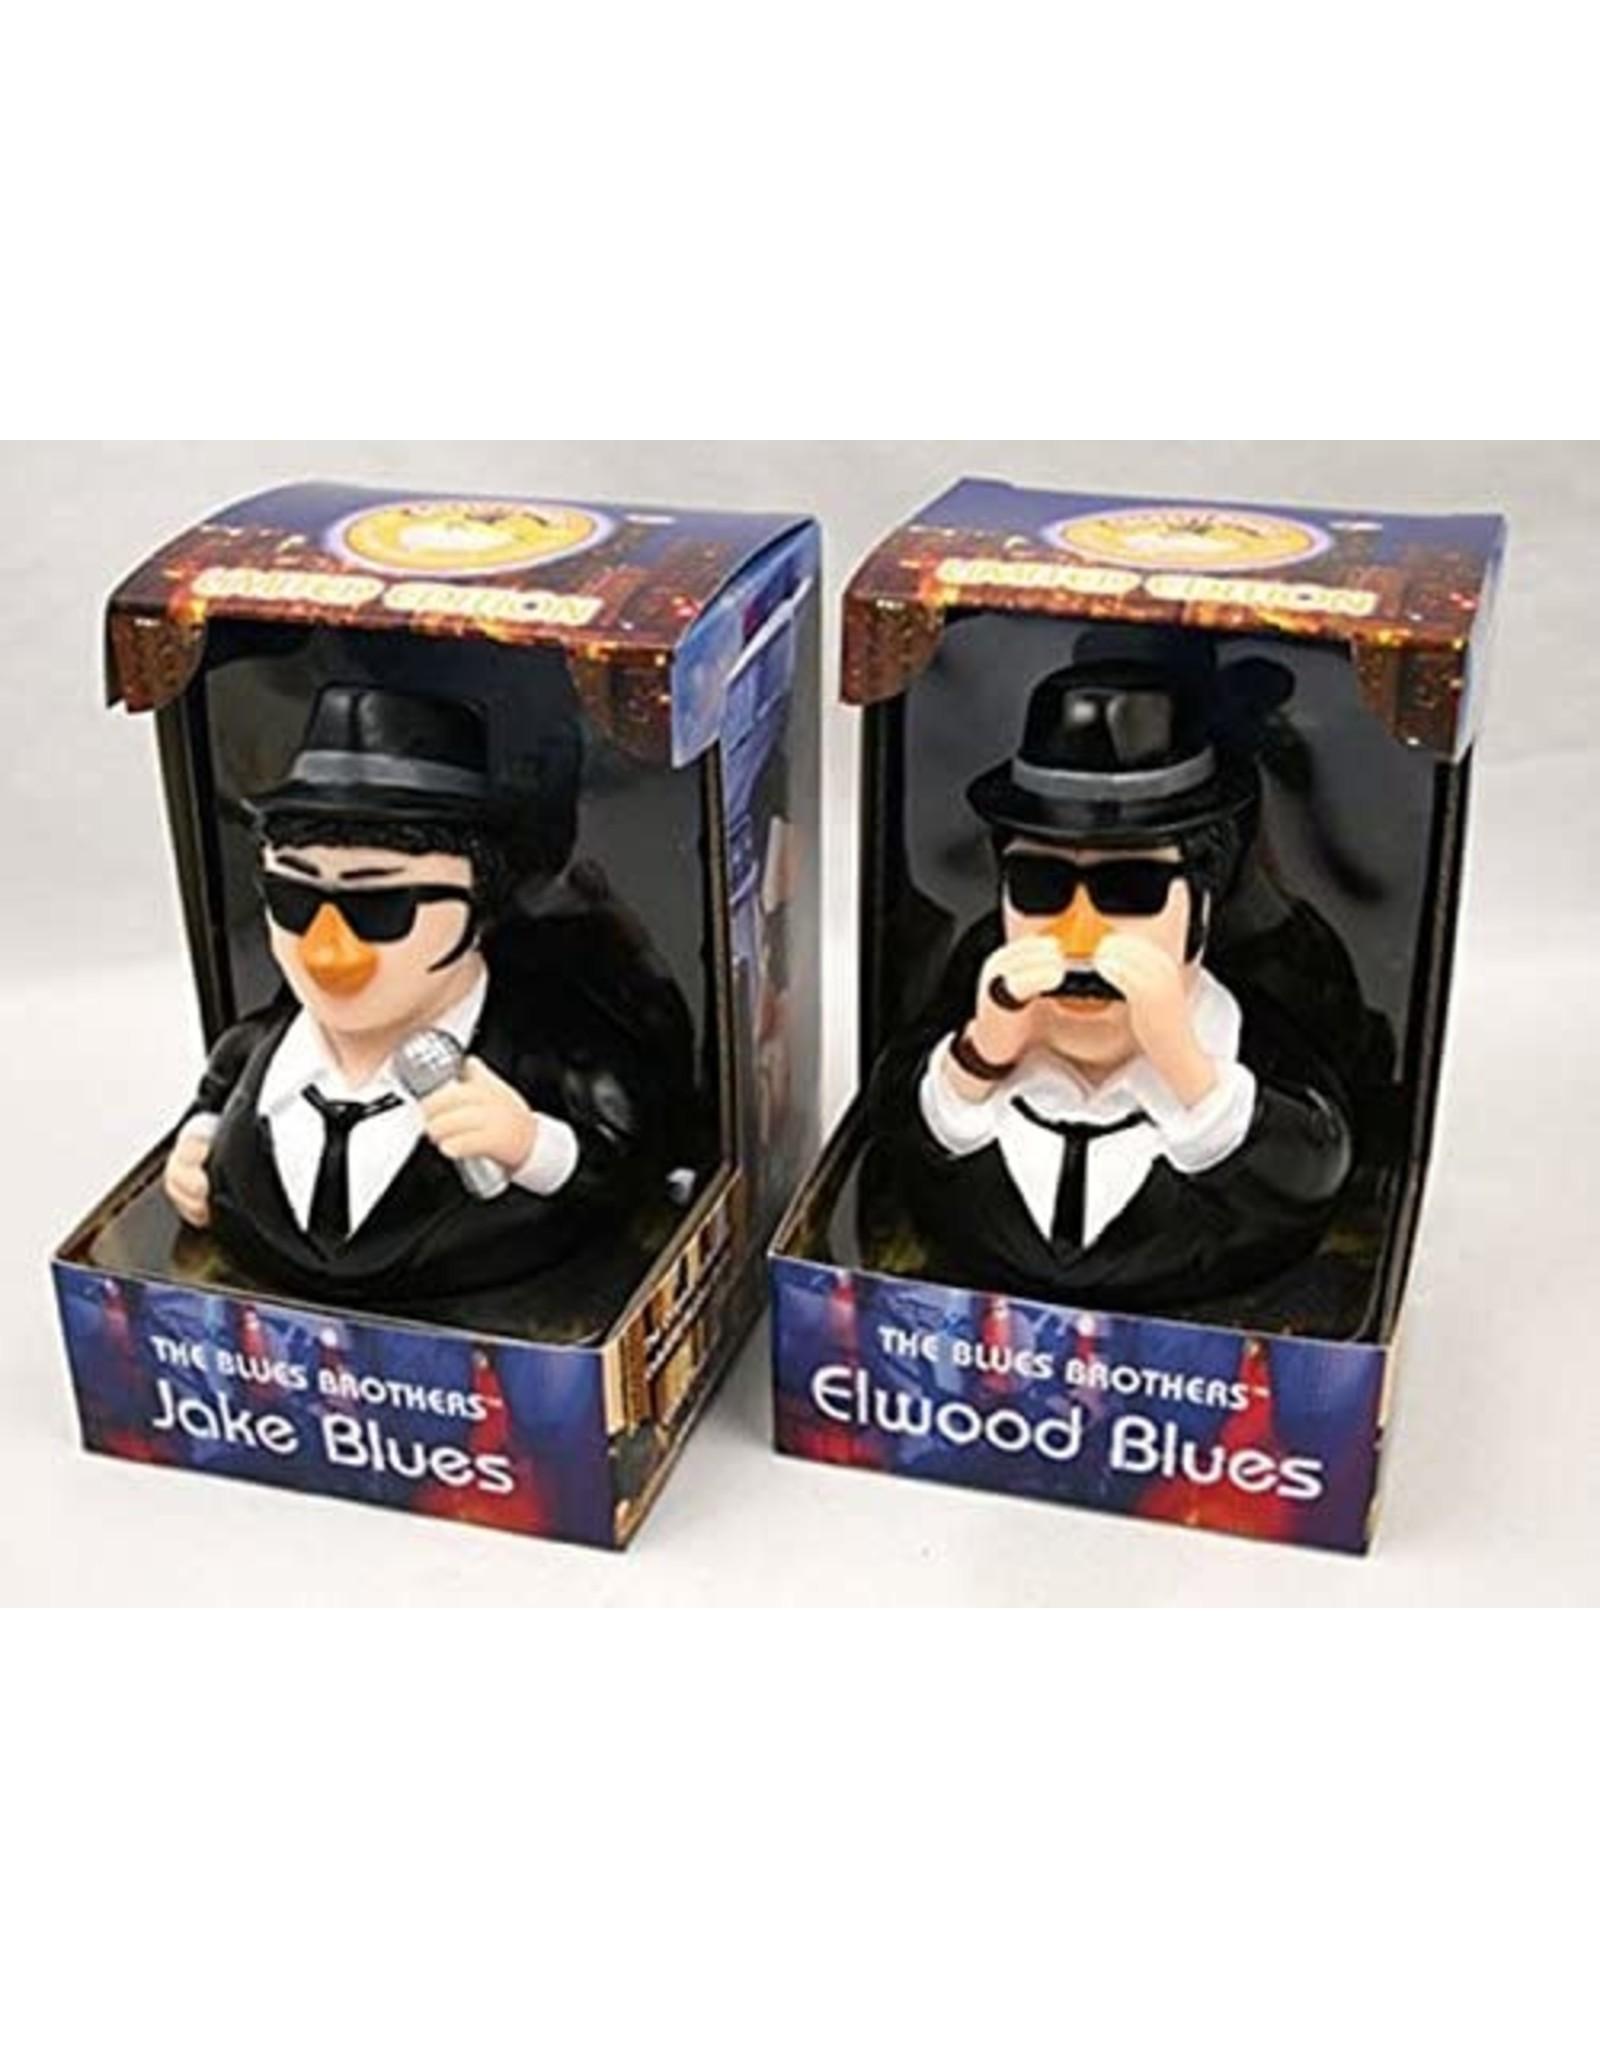 Elwood Blues - Blues Brothers